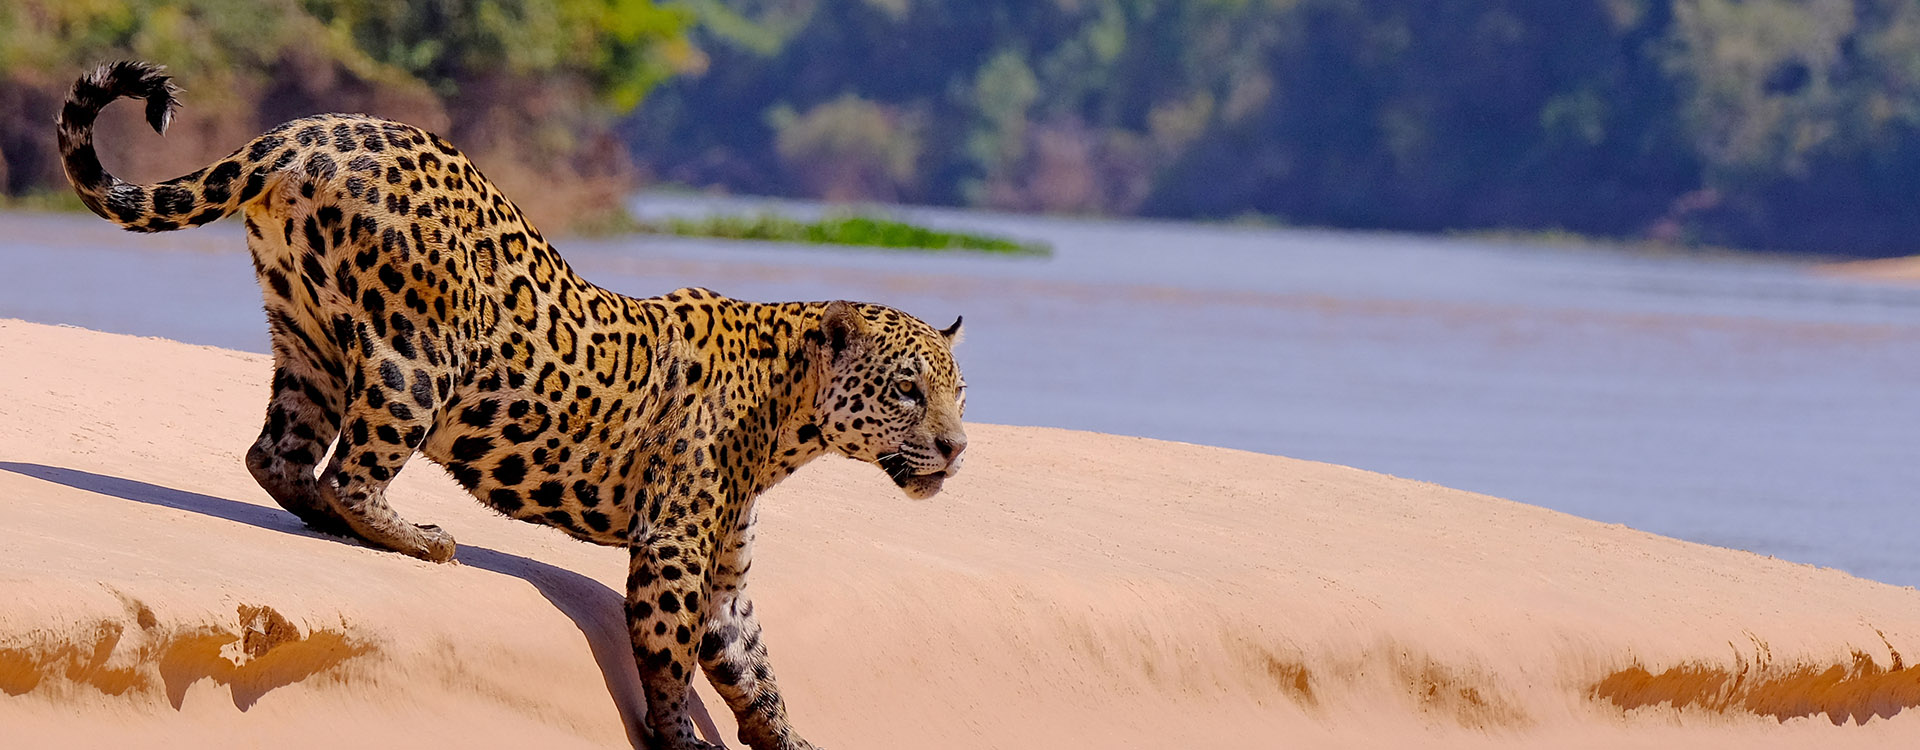 Jaguar, Panthera Onca, Cuiaba River, Porto Jofre, Pantanal Matogrossense, Mato Grosso do Sul, Brazil South America